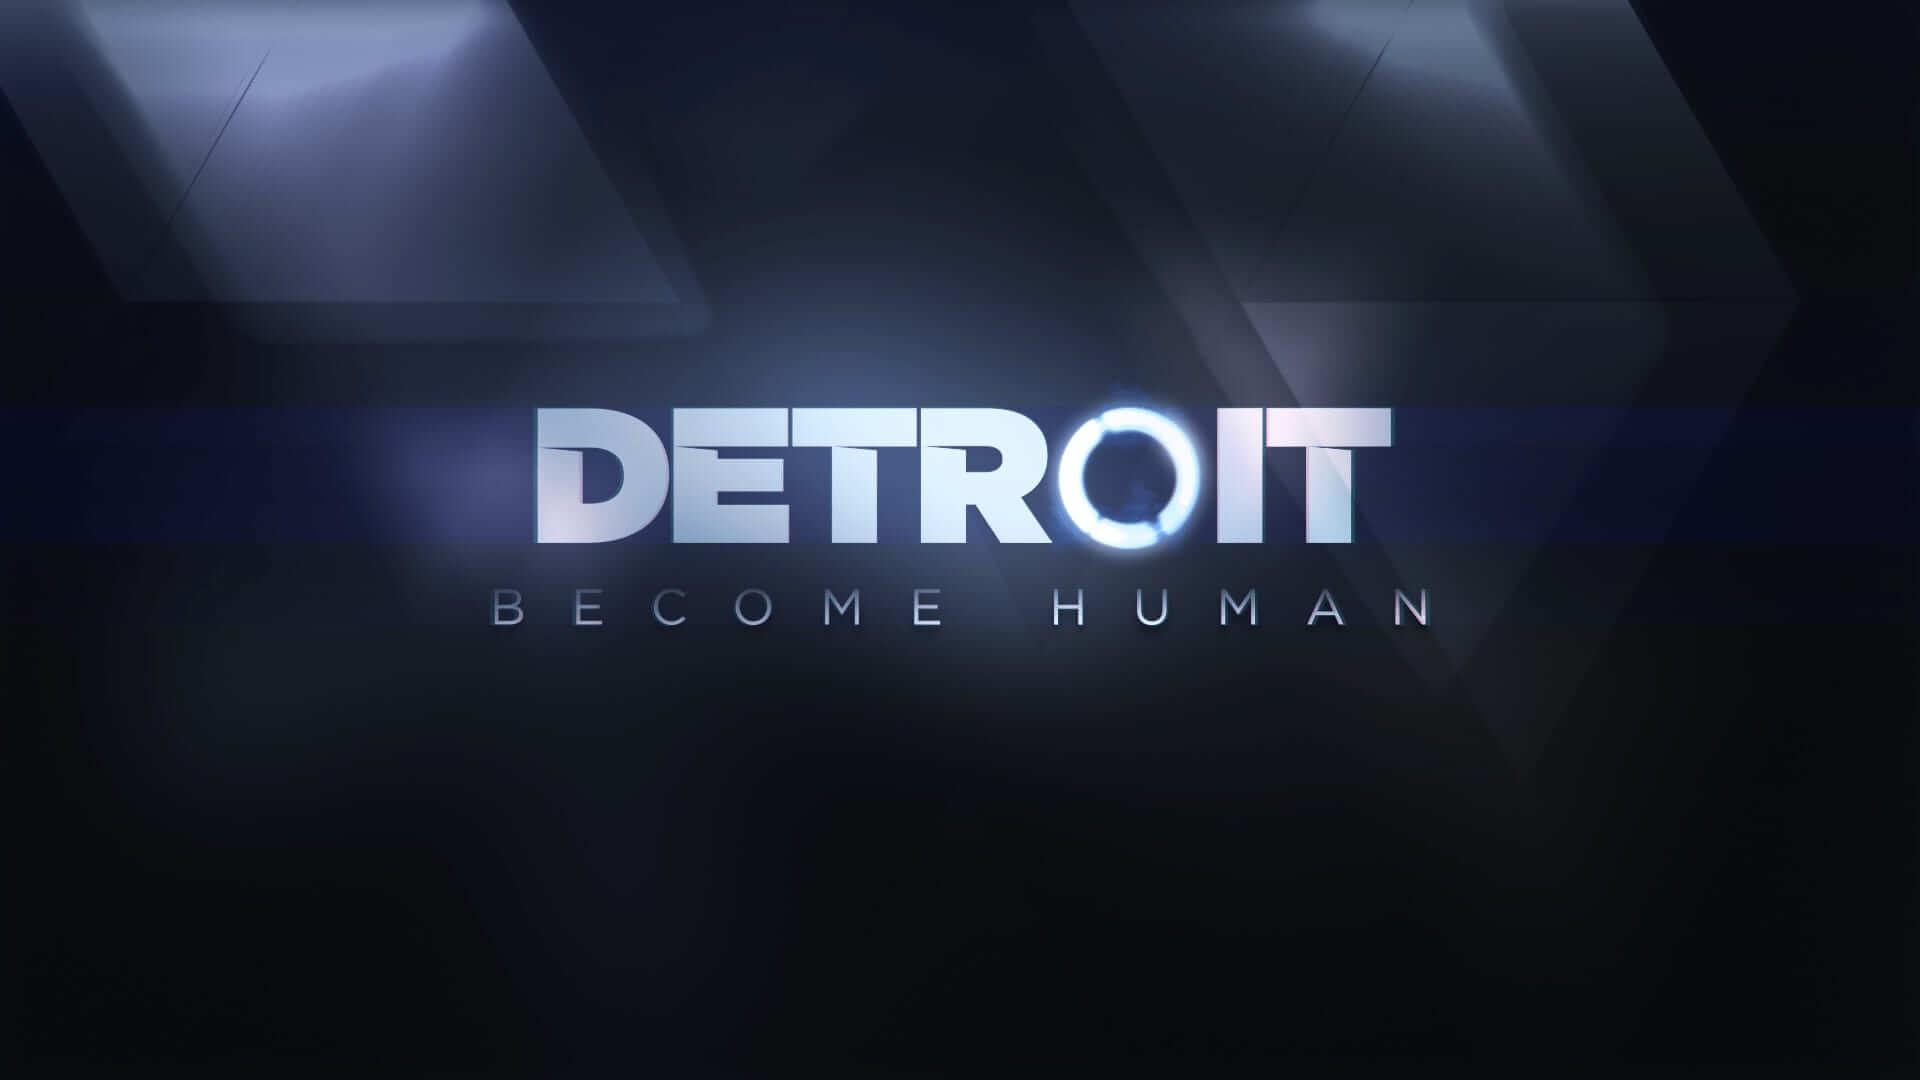 detroit become human 3